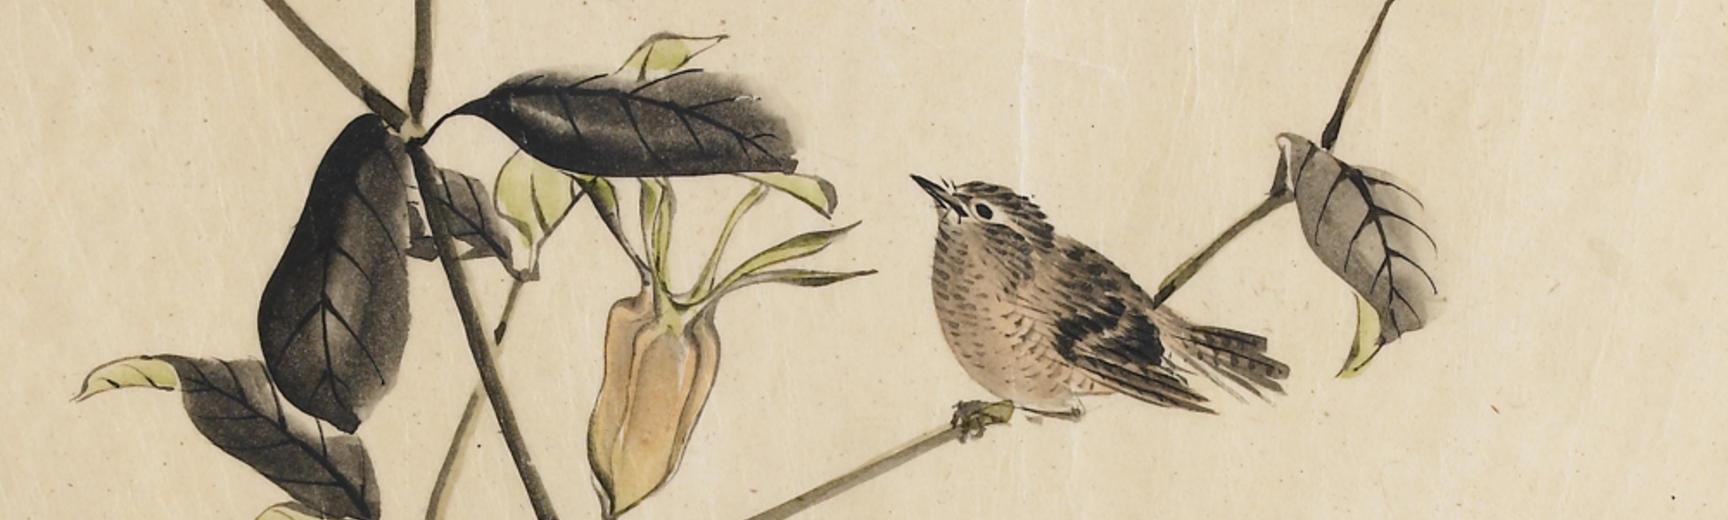 Sparrow on an akebi plant, by Kunii Obun